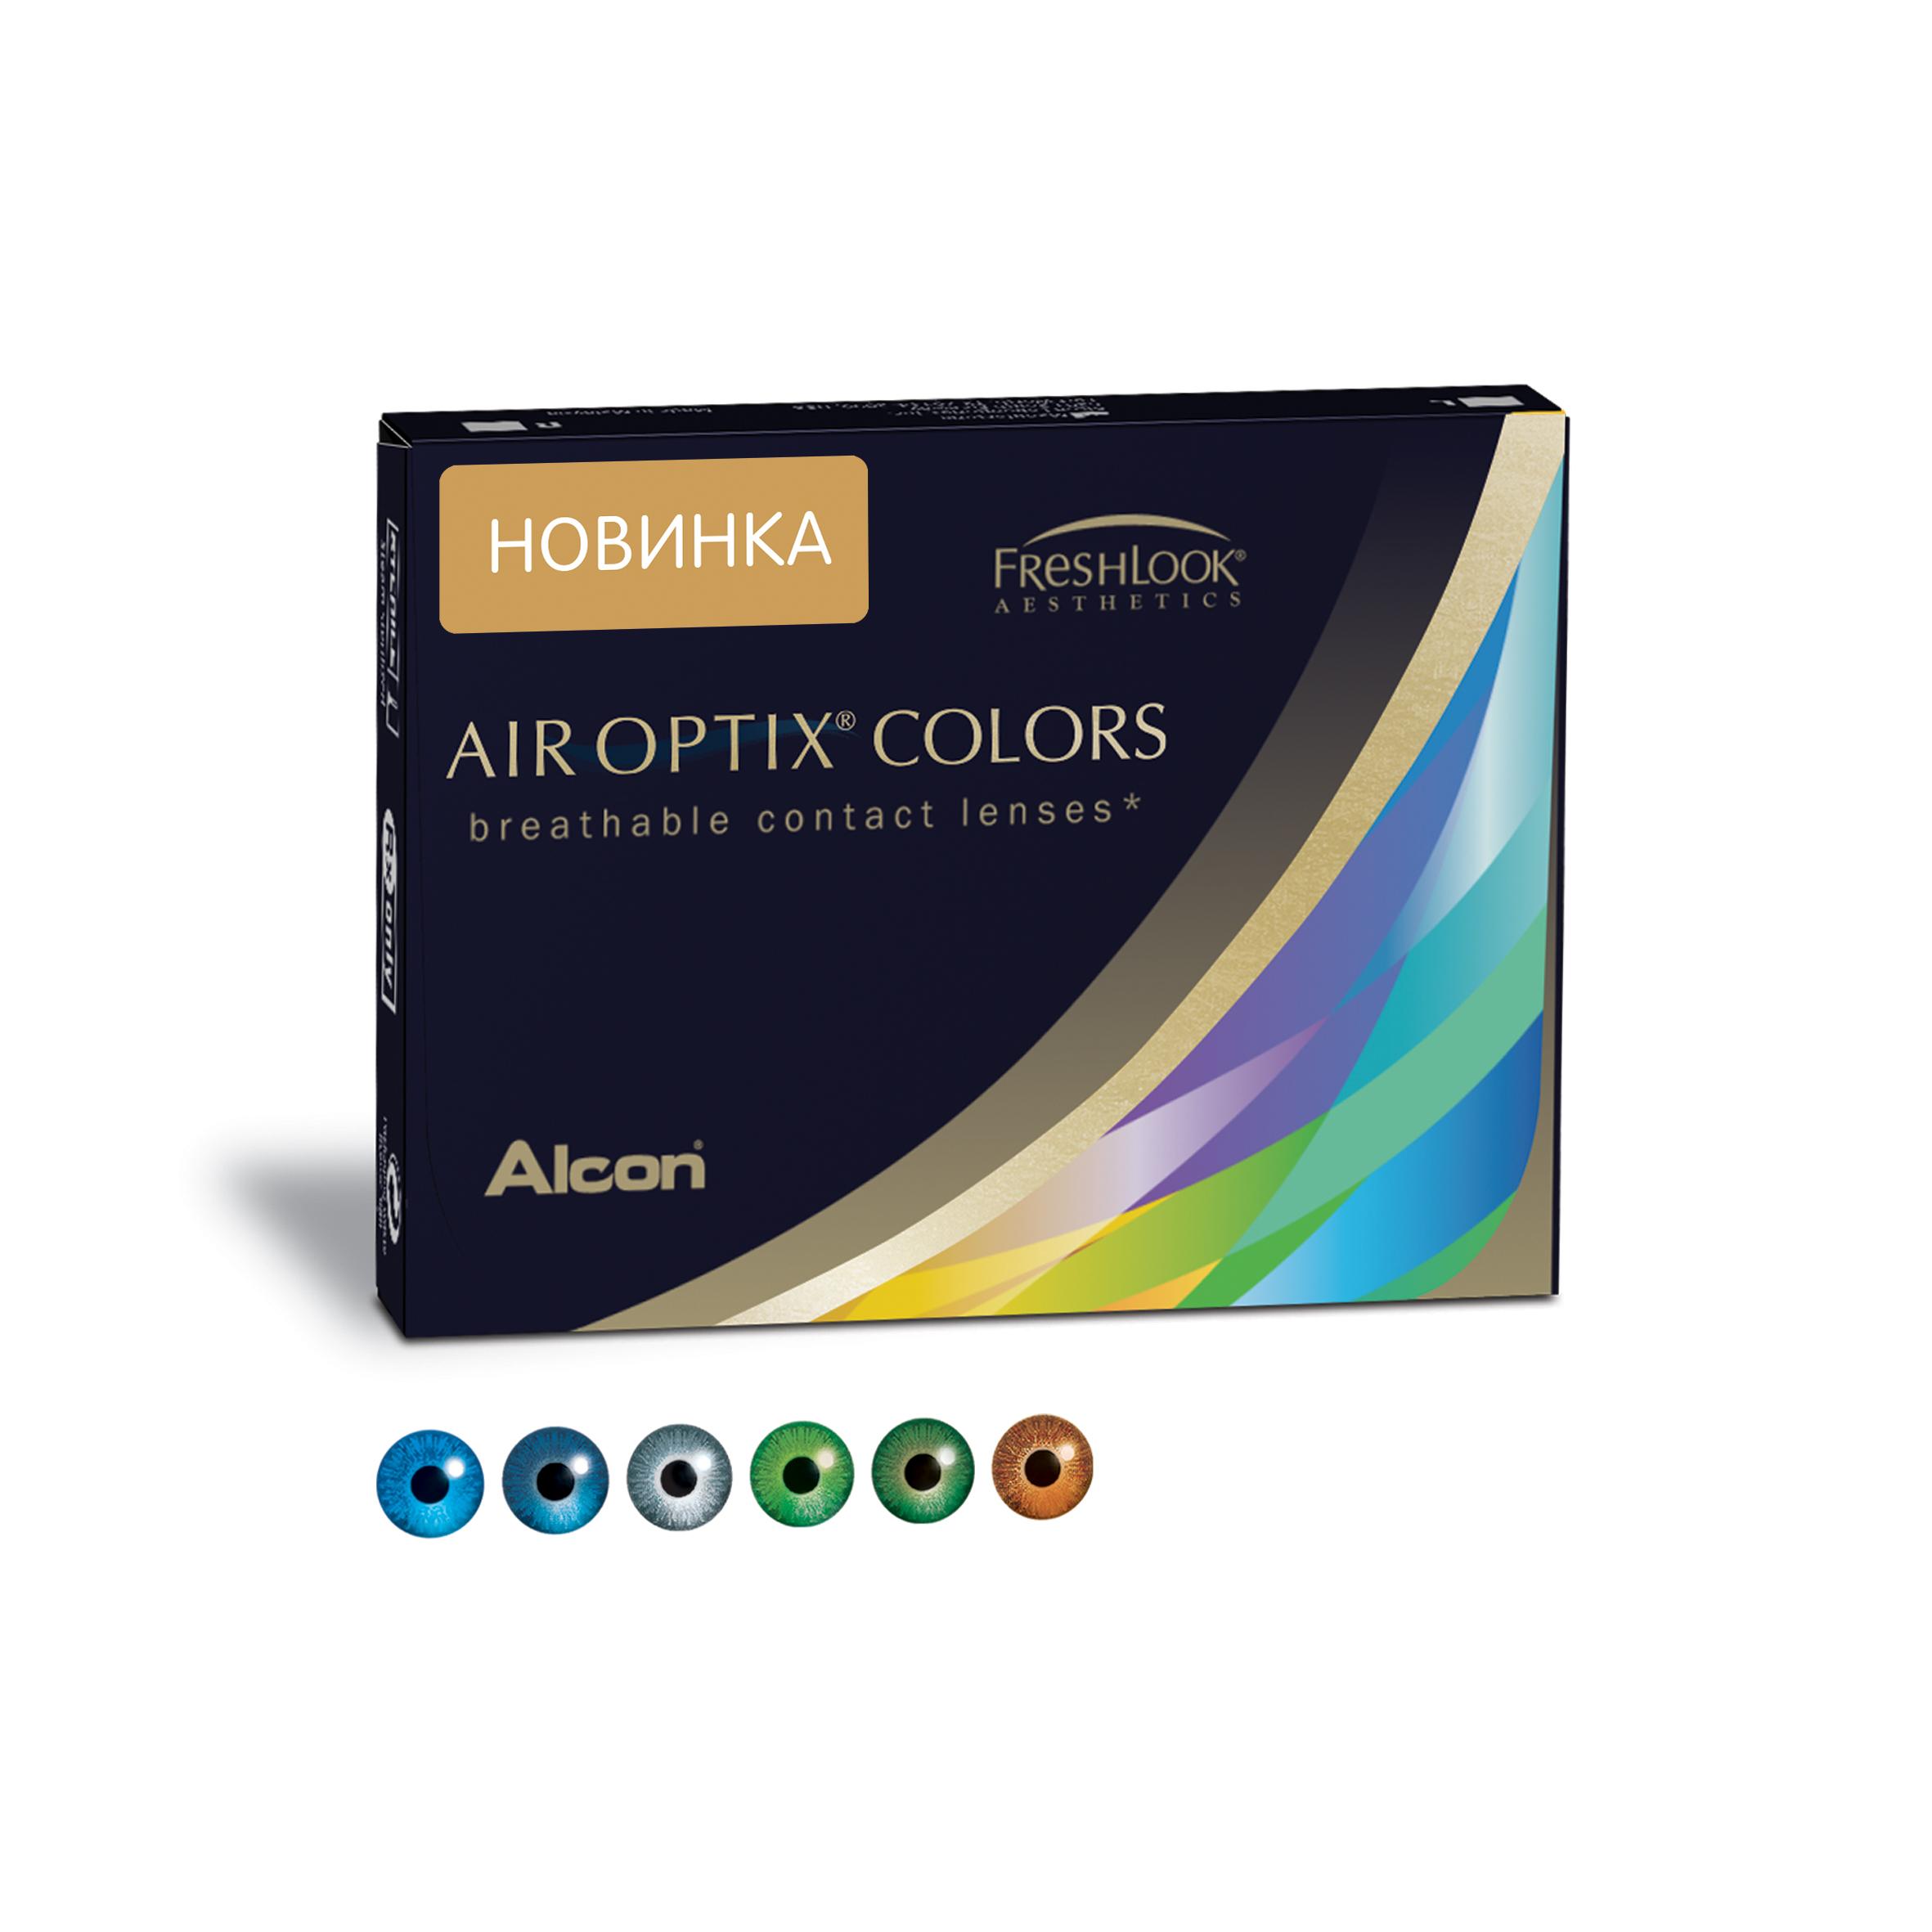 Аlcon контактные линзы Air Optix Colors 2 шт -3.25 Sterling Gray